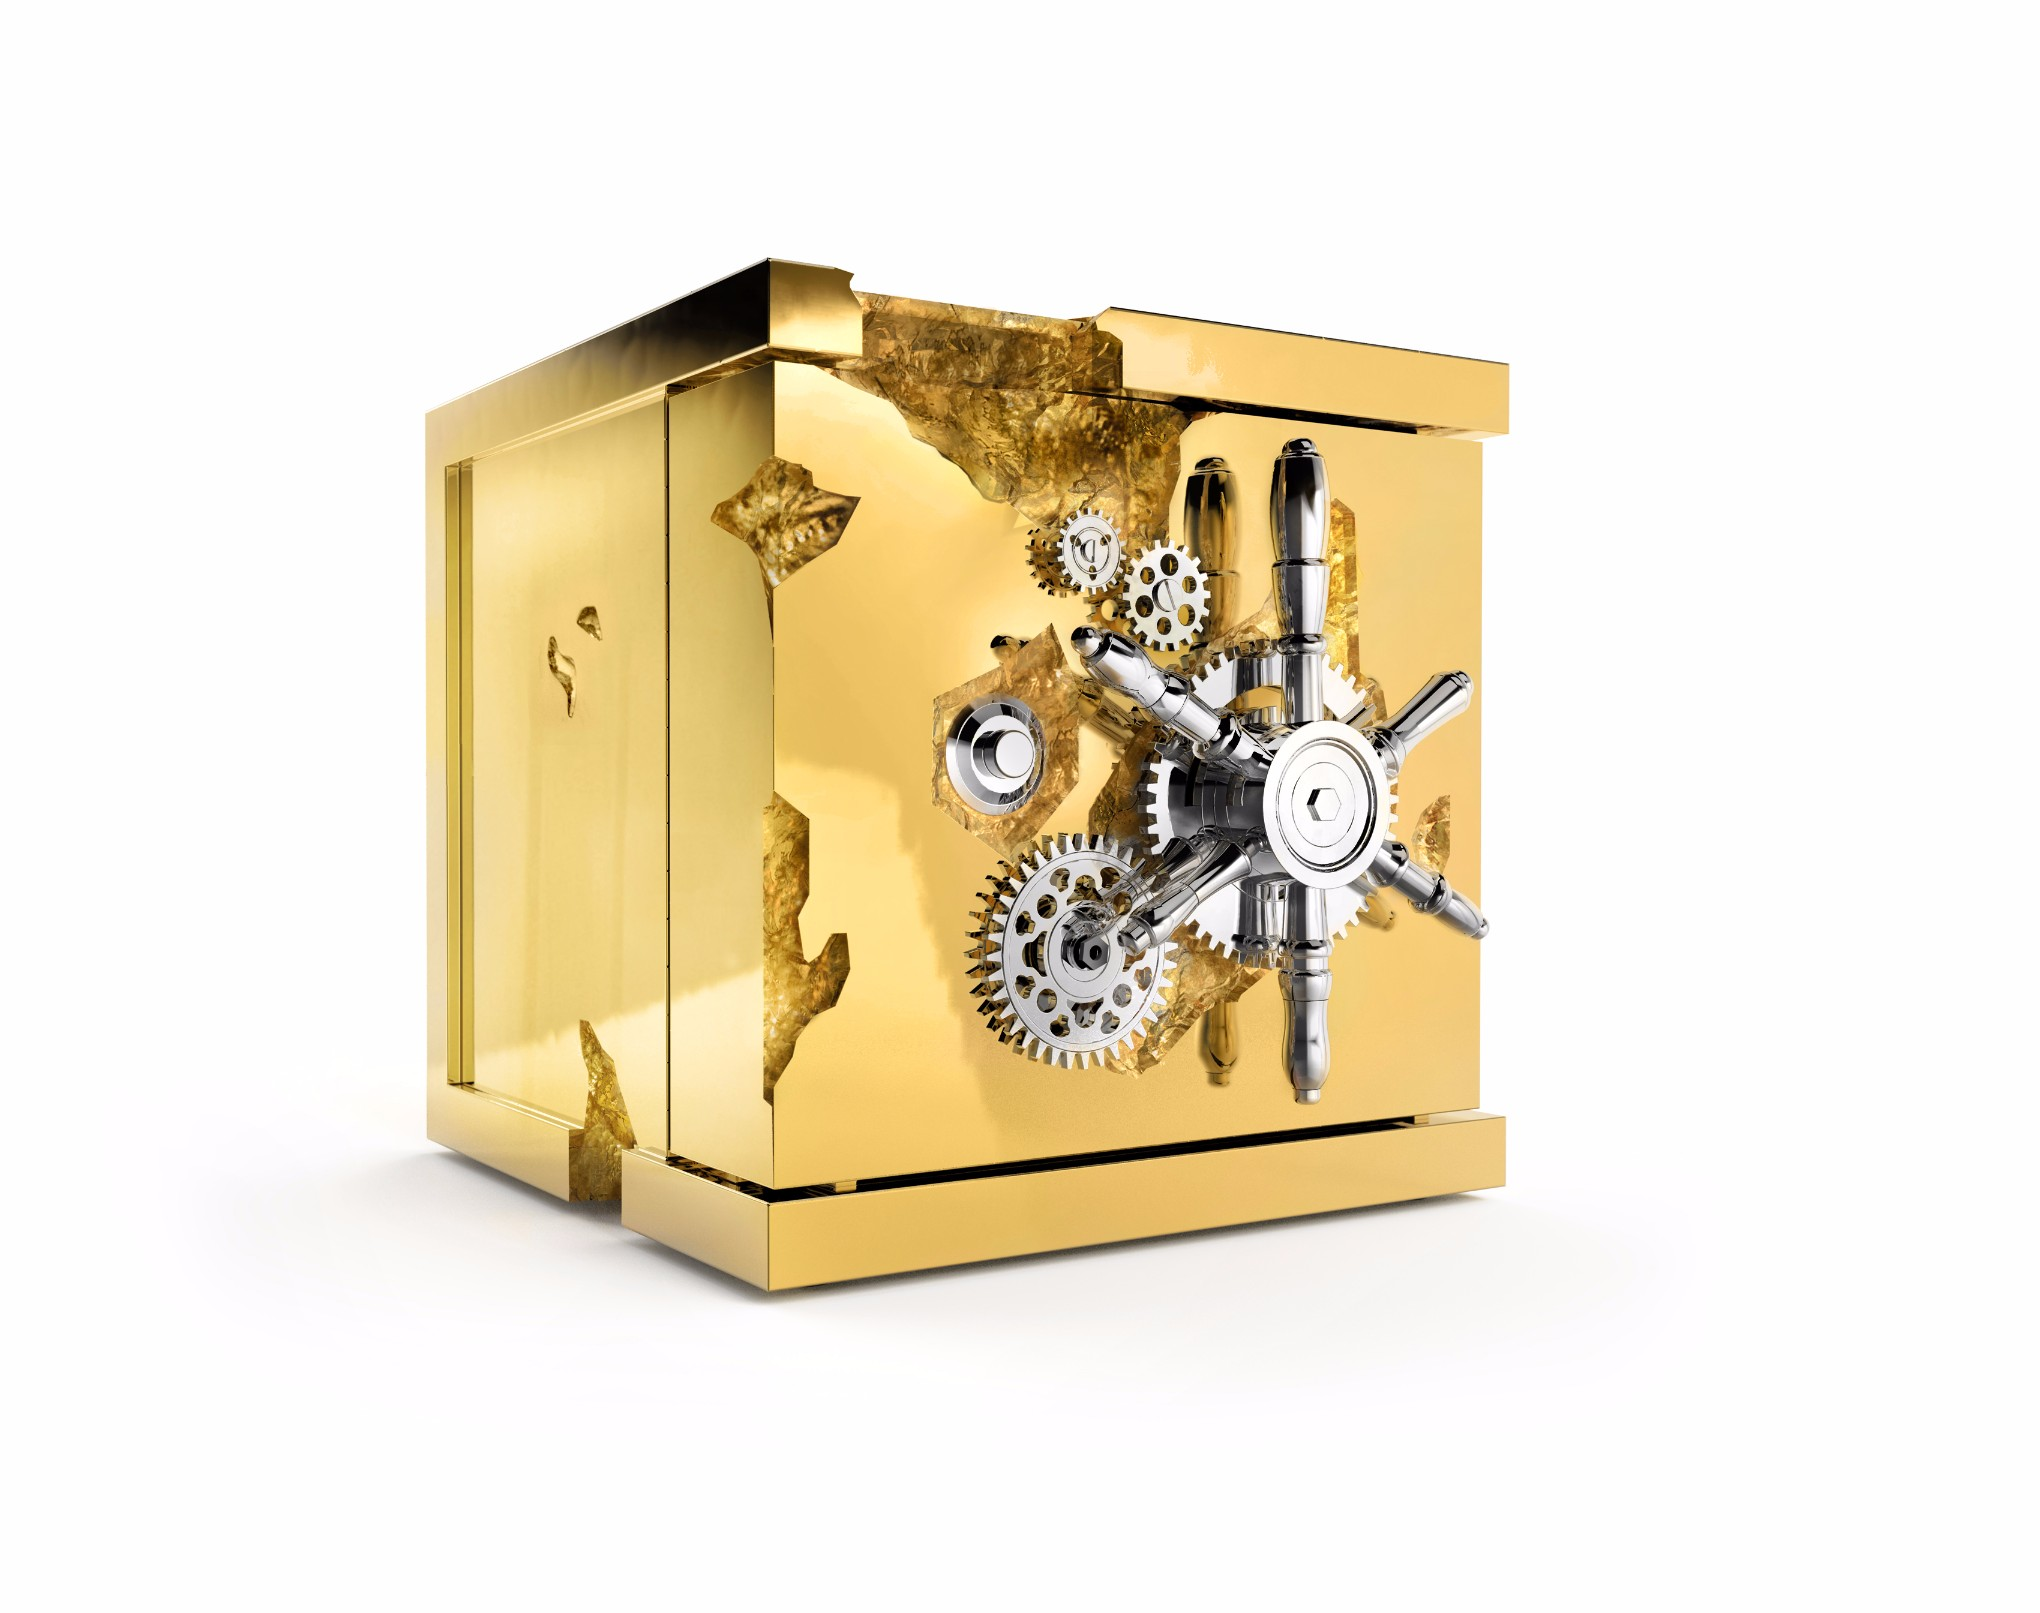 Luxury Wedding Gift Ideas: Luxury Gifts Ideas By Boca Do Lobo